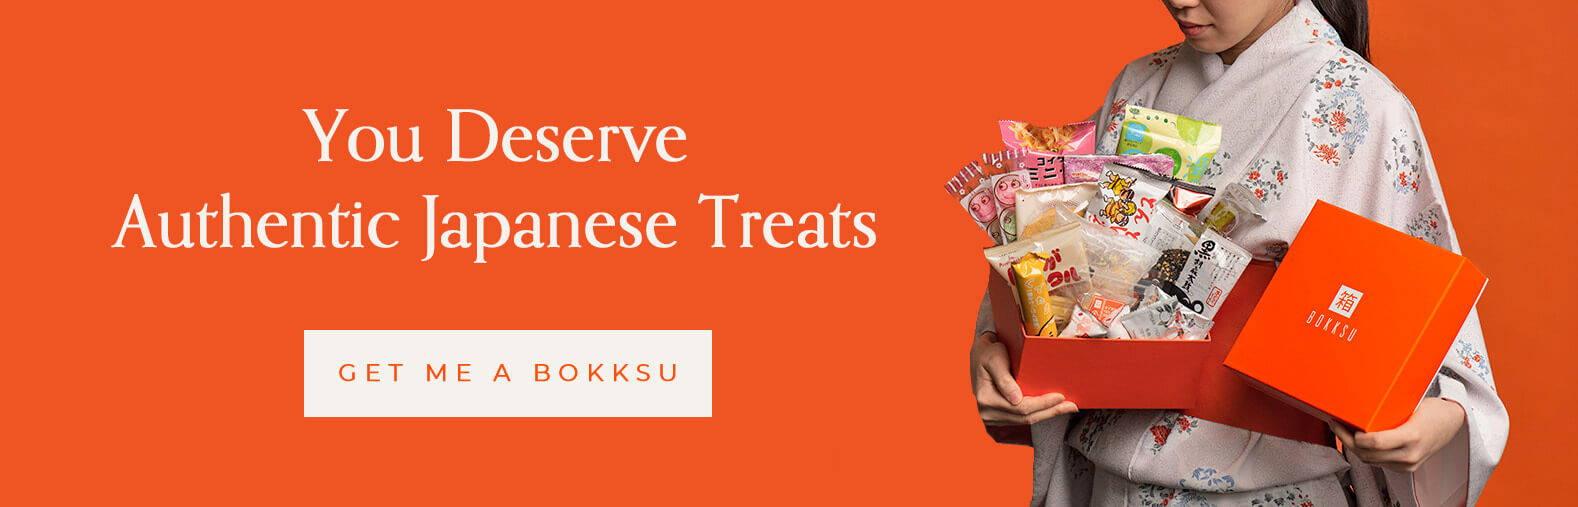 join bokksu japanese snack subscription box service todau